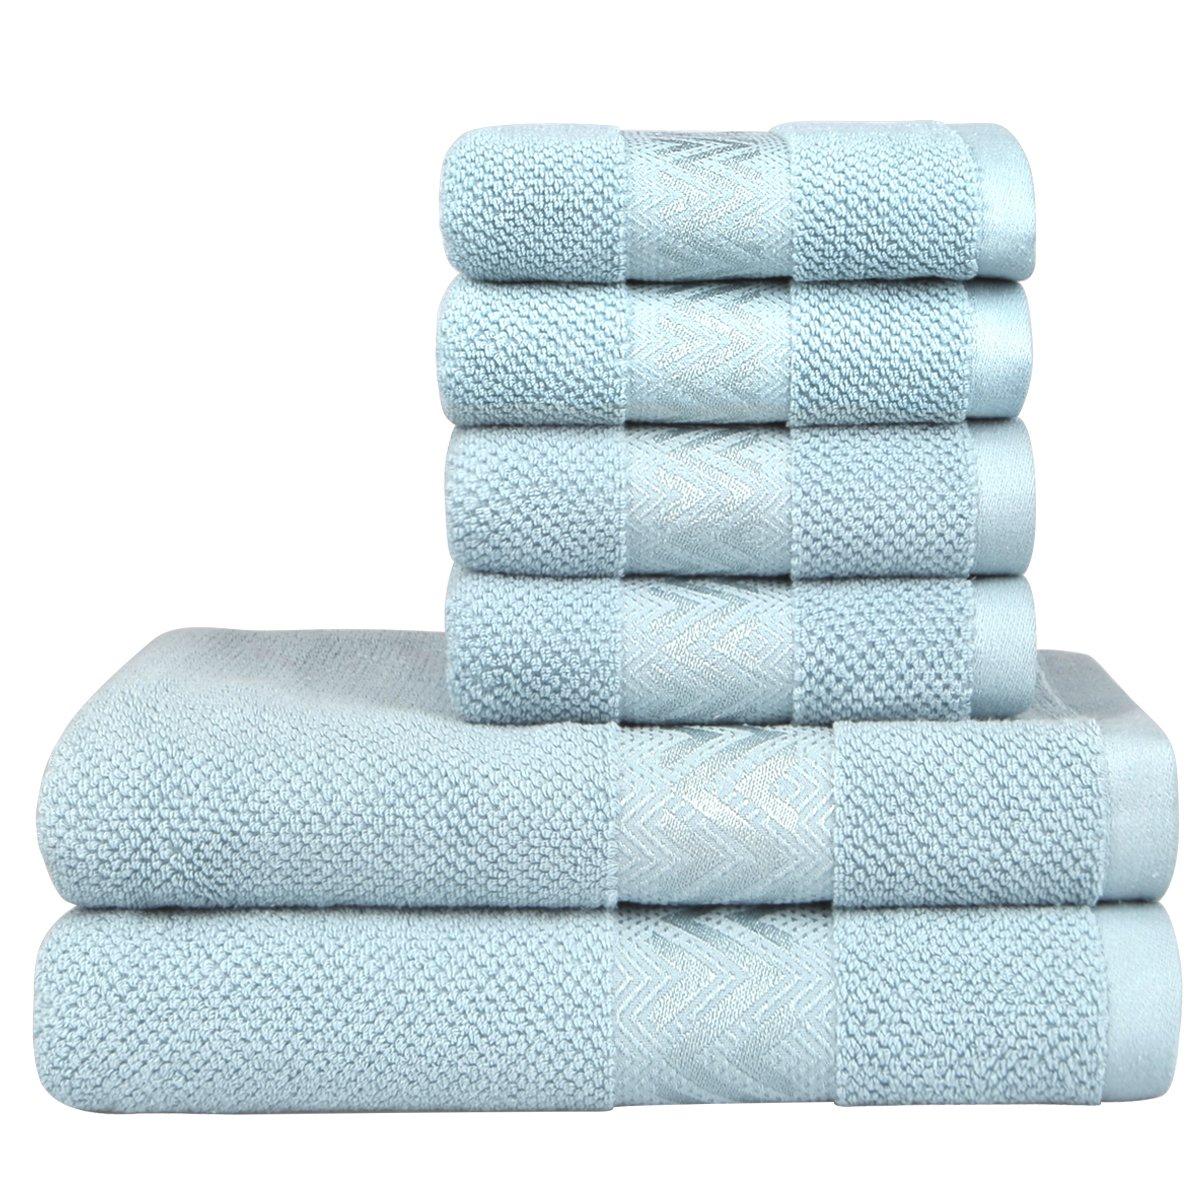 VAVE Luxury Cotton Soft Bath Towels Set Hand Towel Washcloths Quality Bathroom Towels SPA Hotel Home Travel Beach Sauna Spring Summer Autumn Winter Super Absorbent Kitchen Decorative (Light Blue)